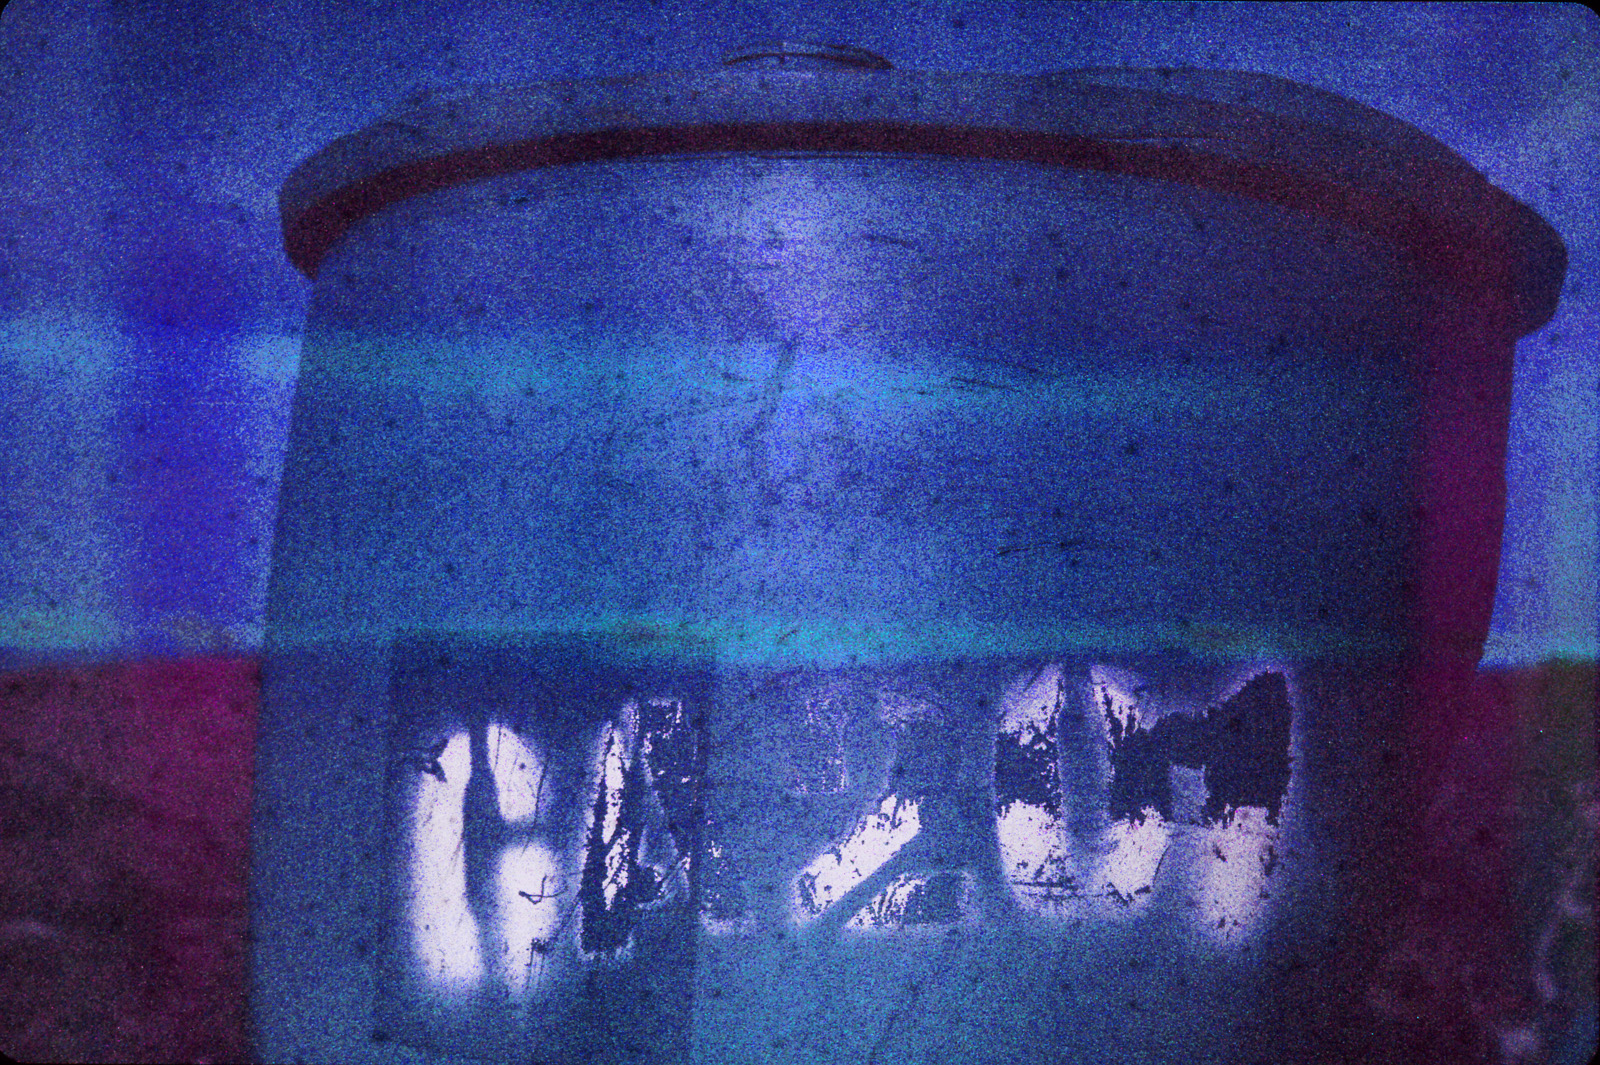 polachrome 35mm colour slide film